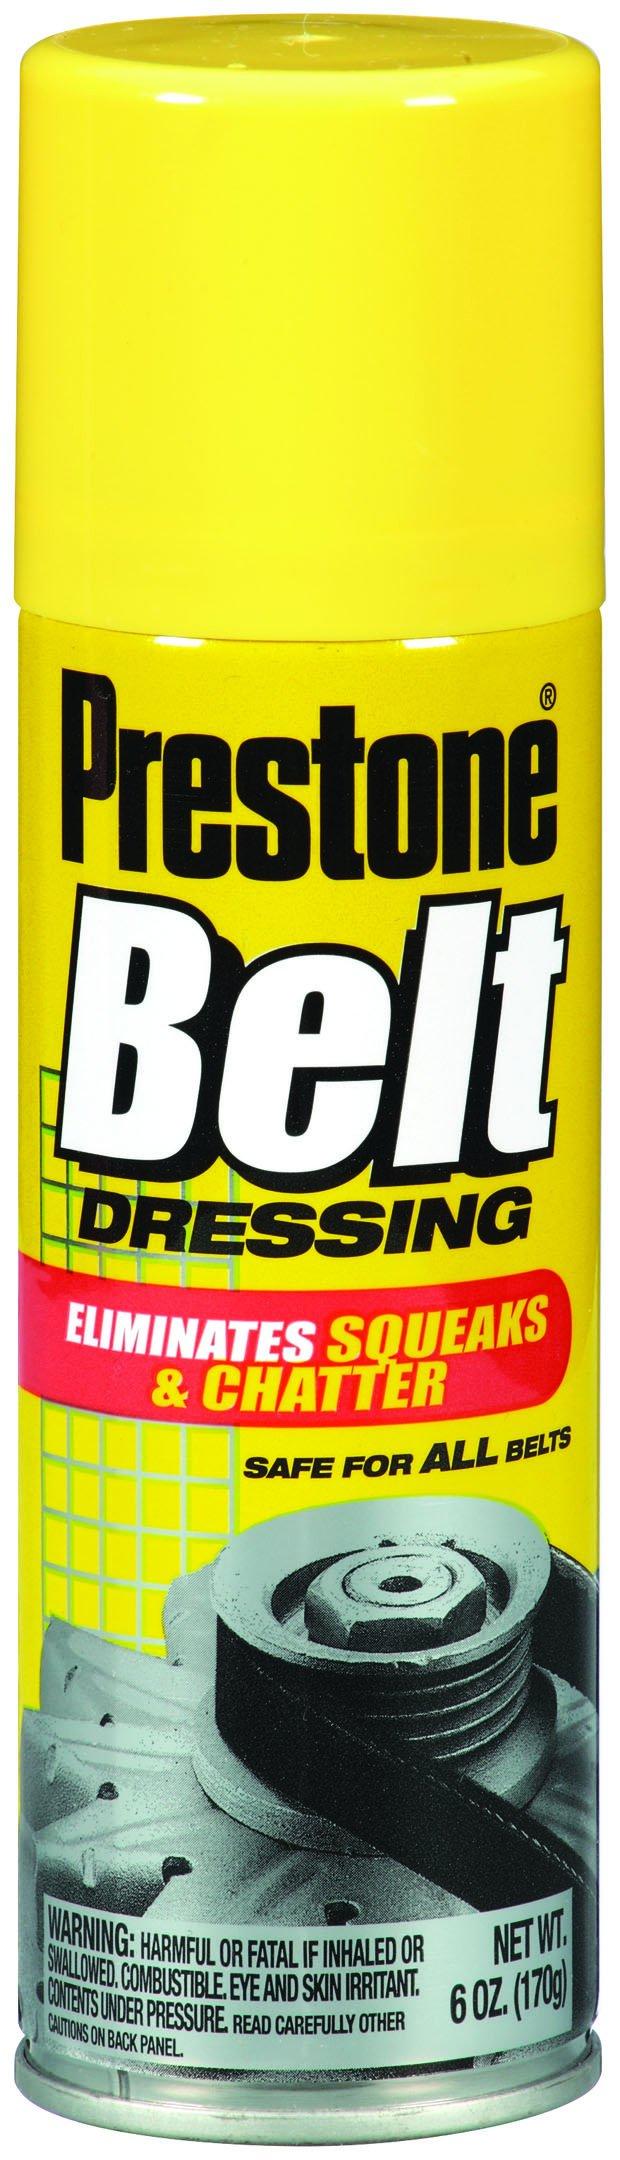 Prestone AS325 Belt Dressing - 6